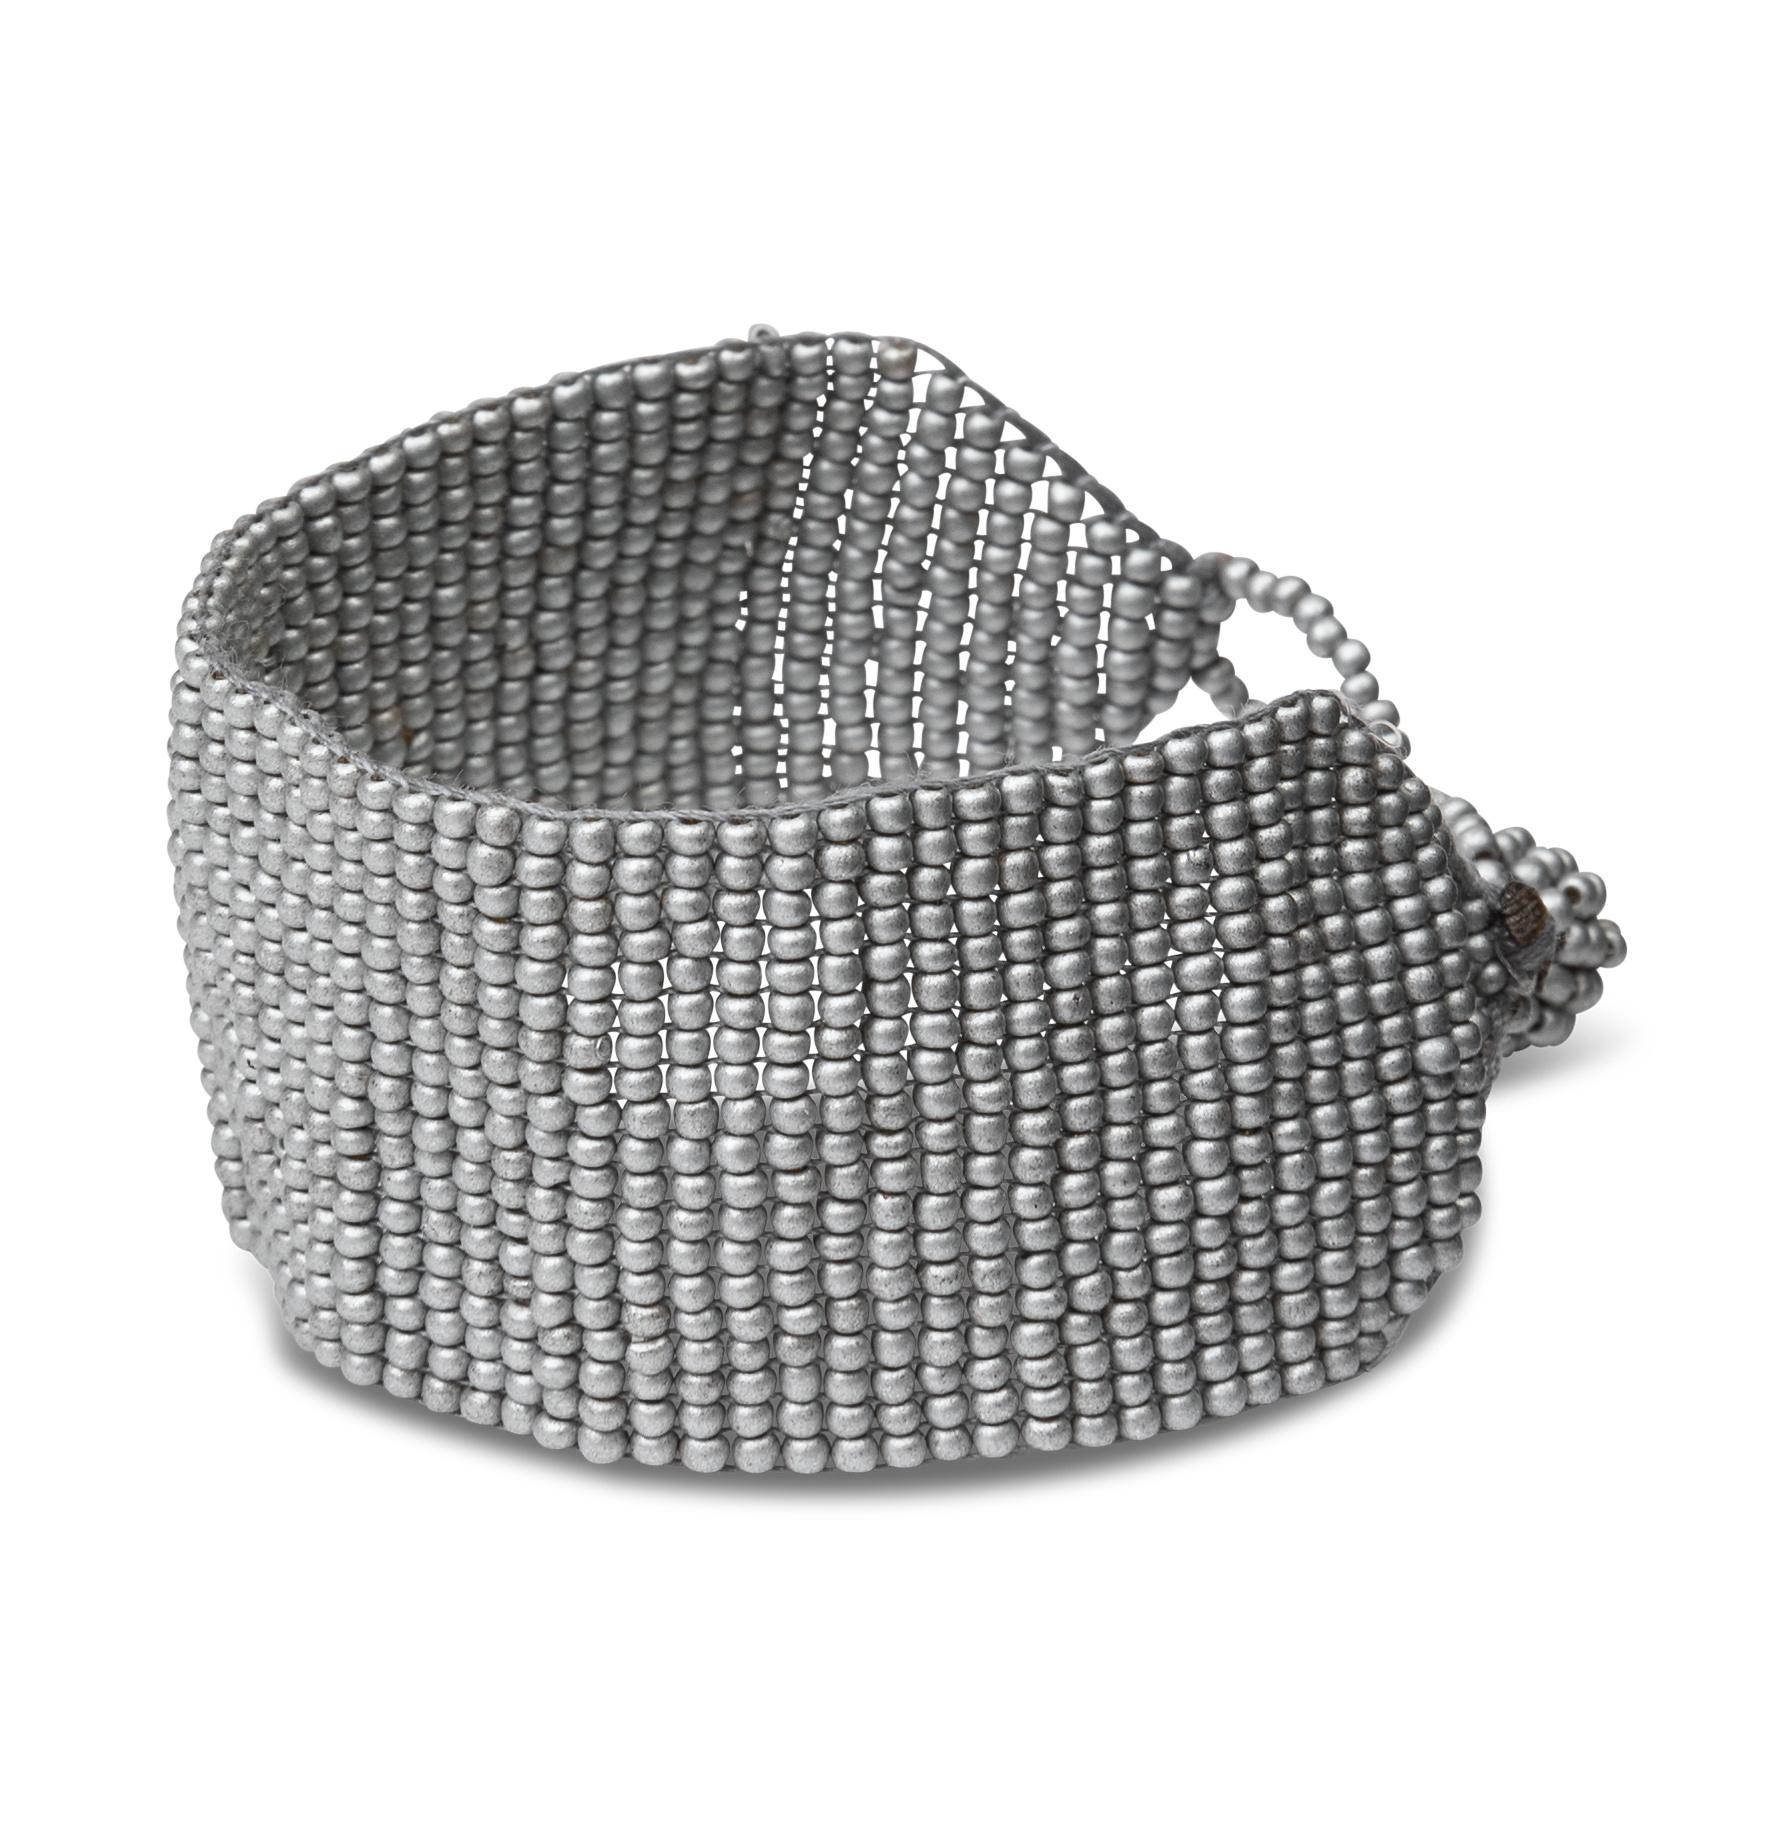 yaya Bracelet with beads 133383-014-1